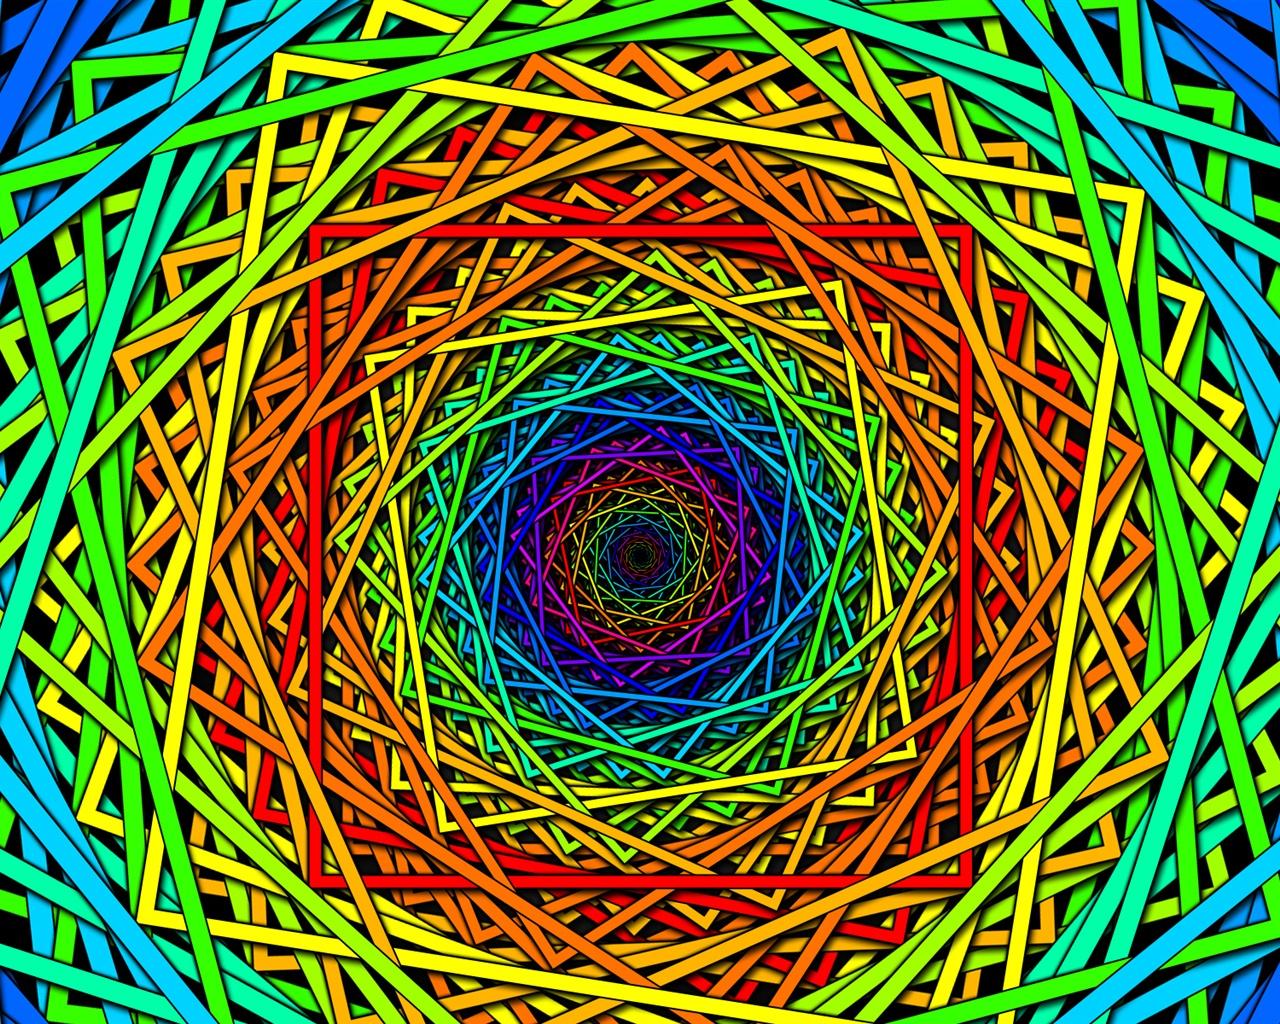 fonds d u0026 39  u00e9cran images abstraites  lignes  couleurs  motif